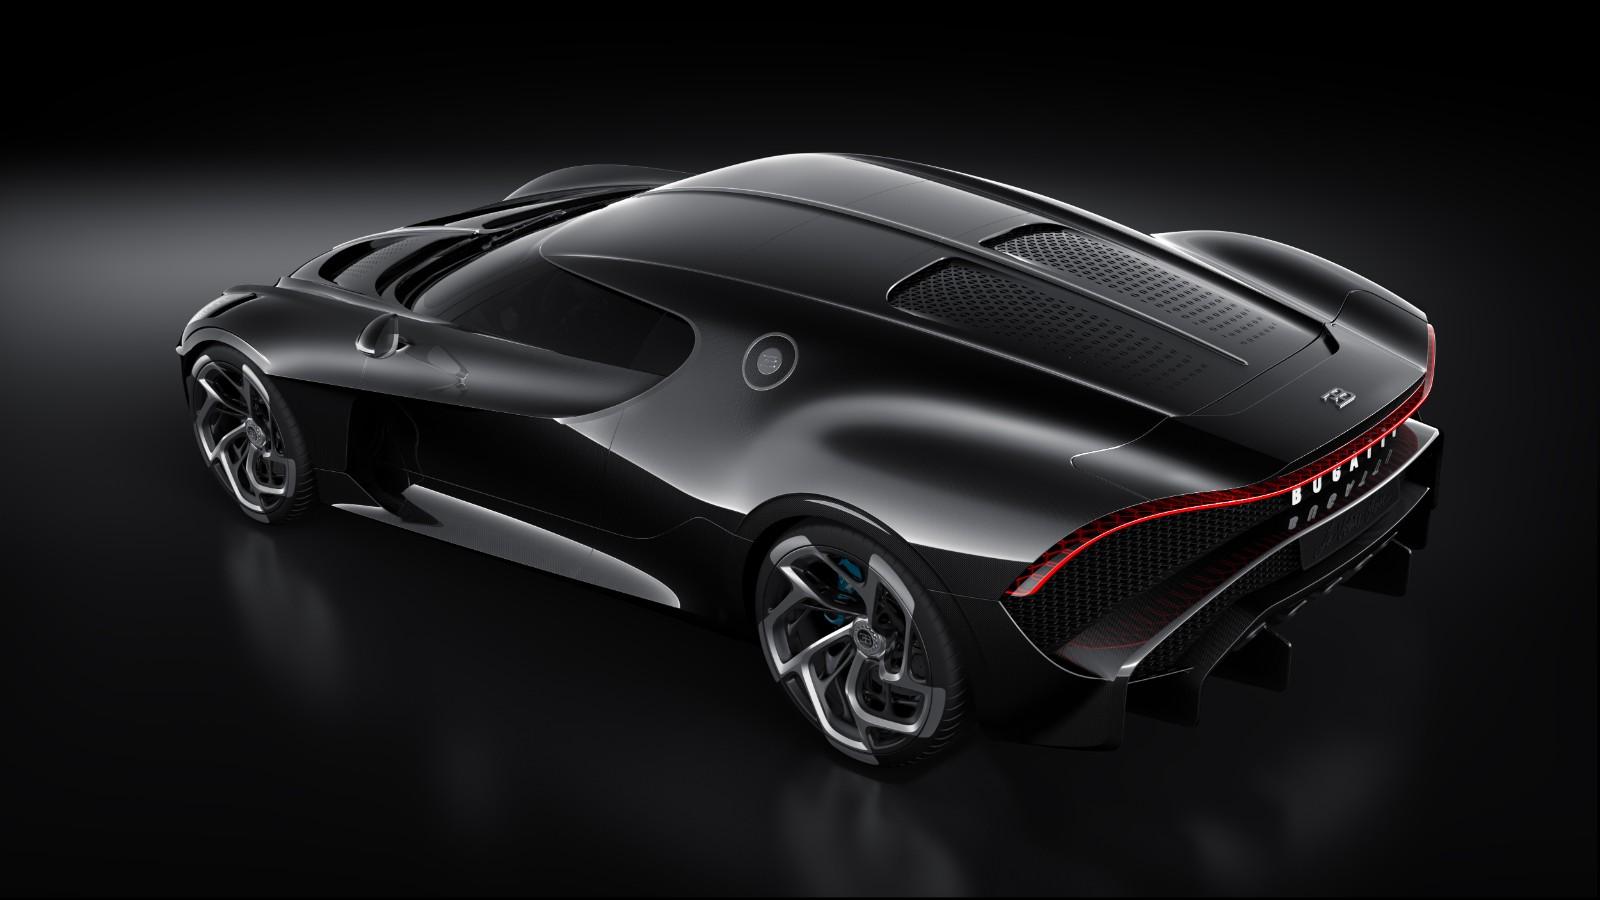 Bugatti Voiture Noire